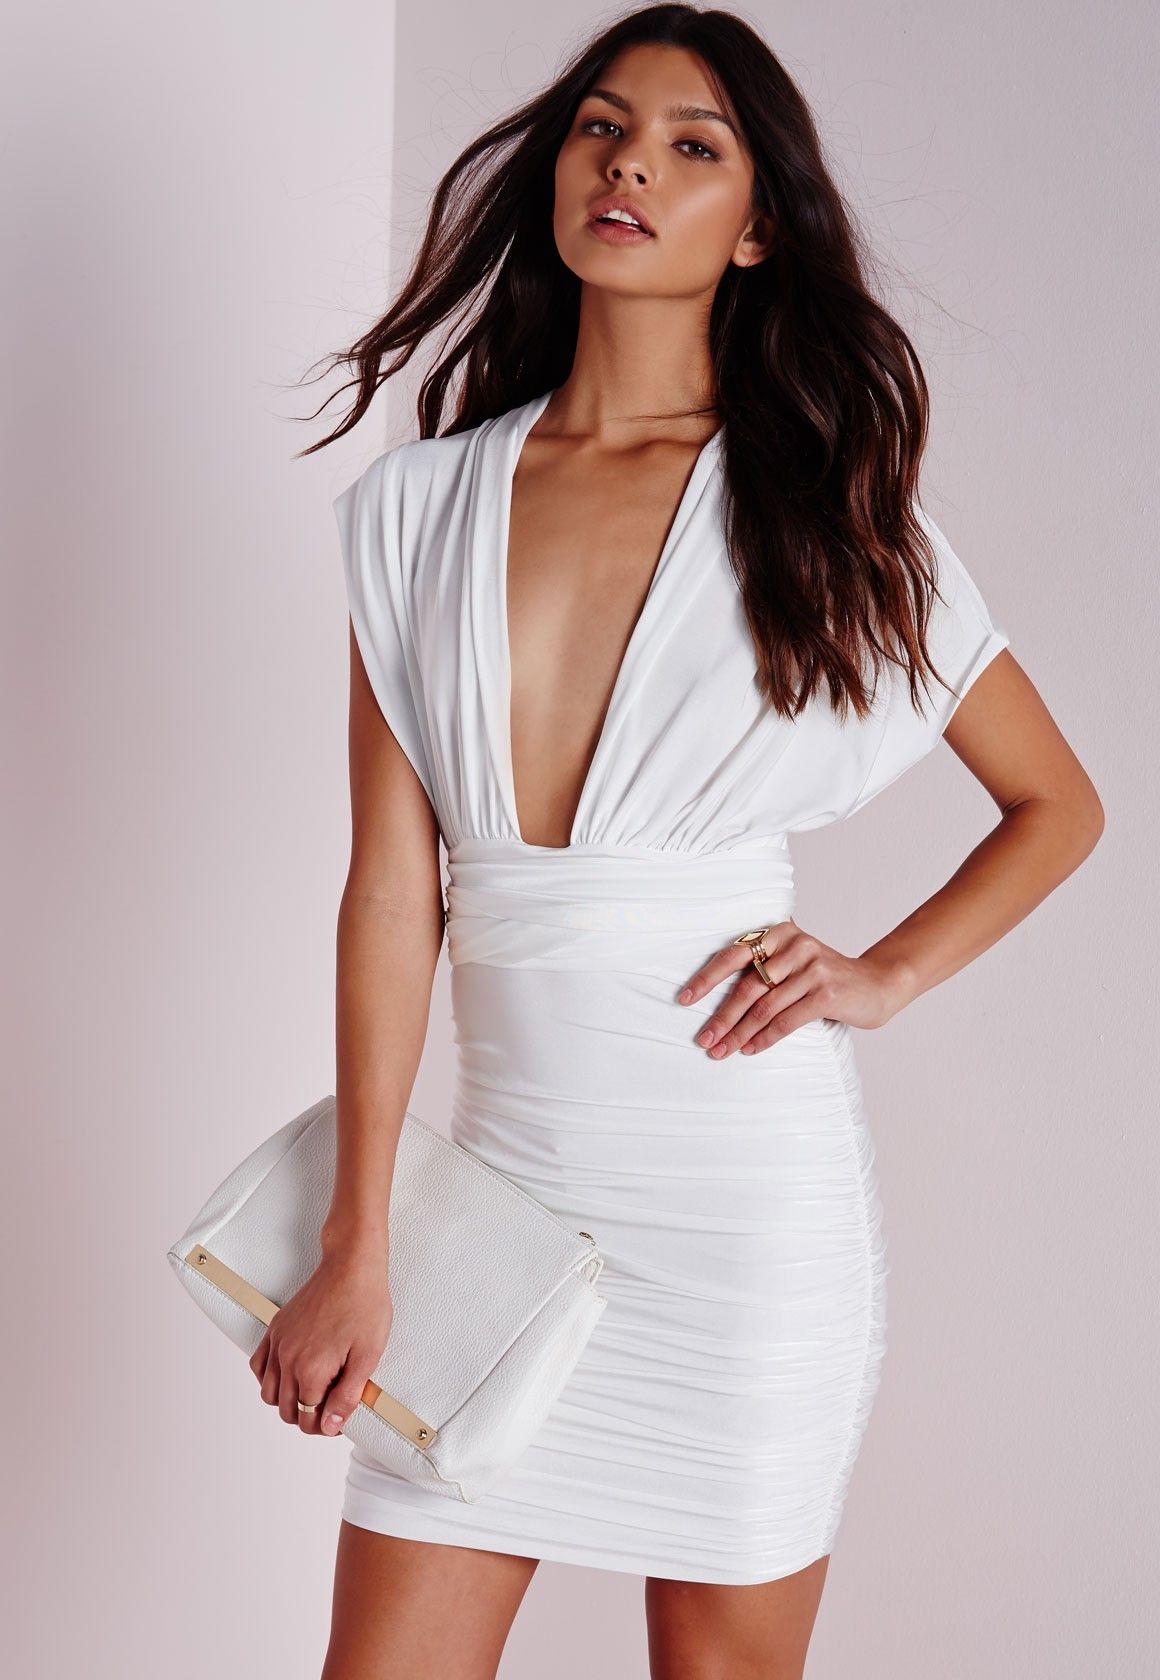 f34617f68c Missguided - Do It Any Way Multiway Slinky Bodycon Dress White ...